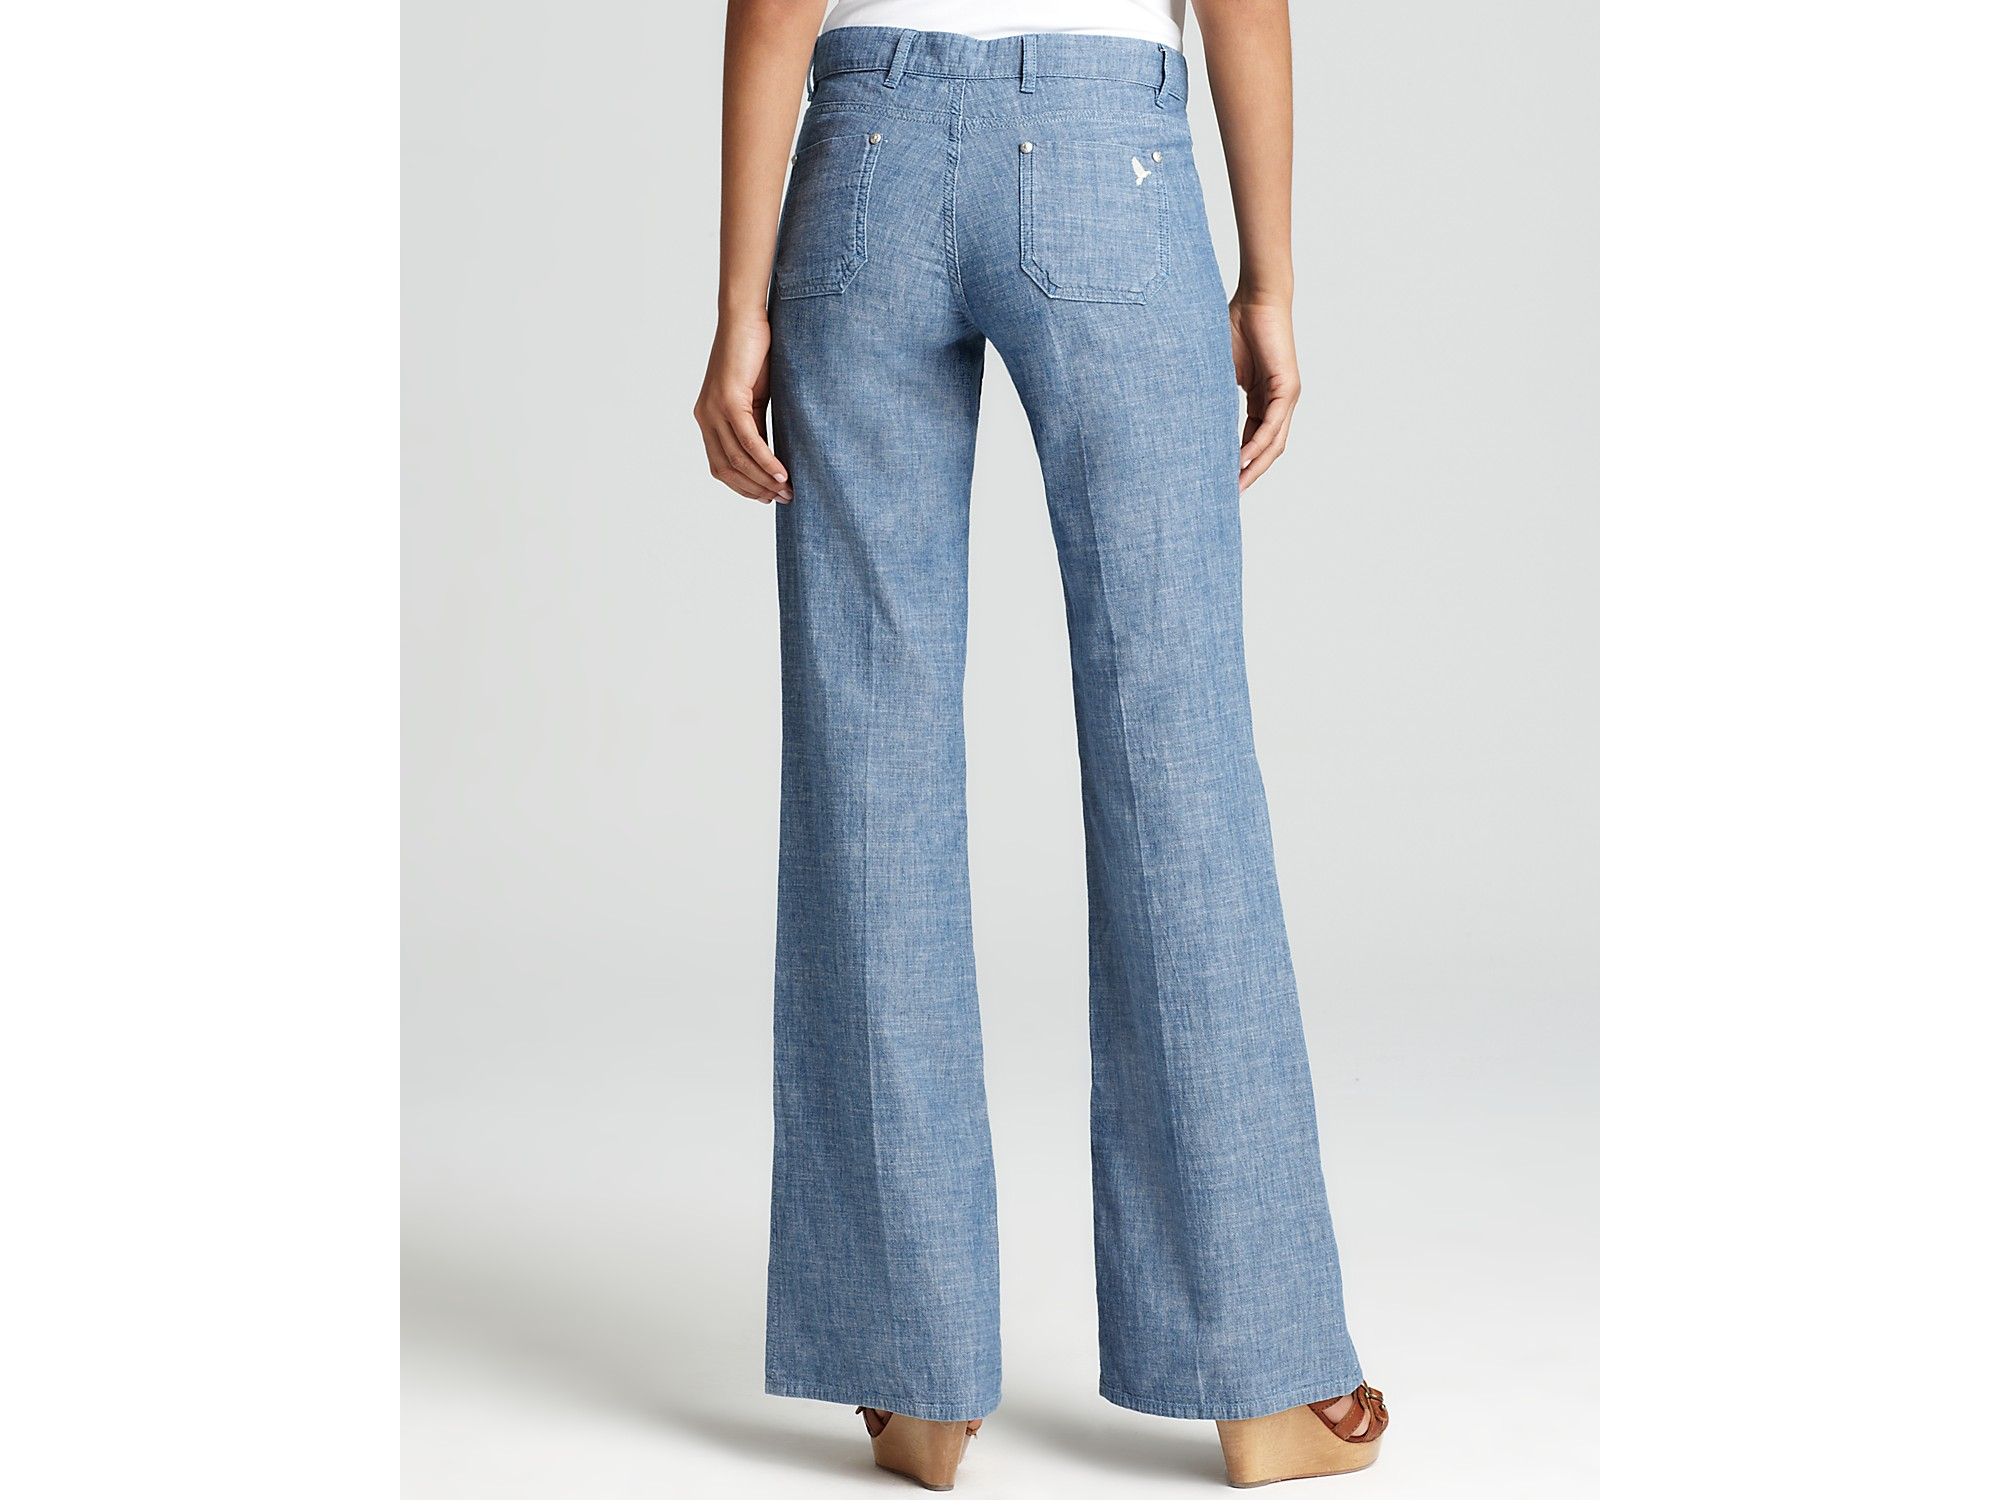 M.i.h jeans Pants Miramar Patch Pocket Wide Leg Chambray Pants in ...